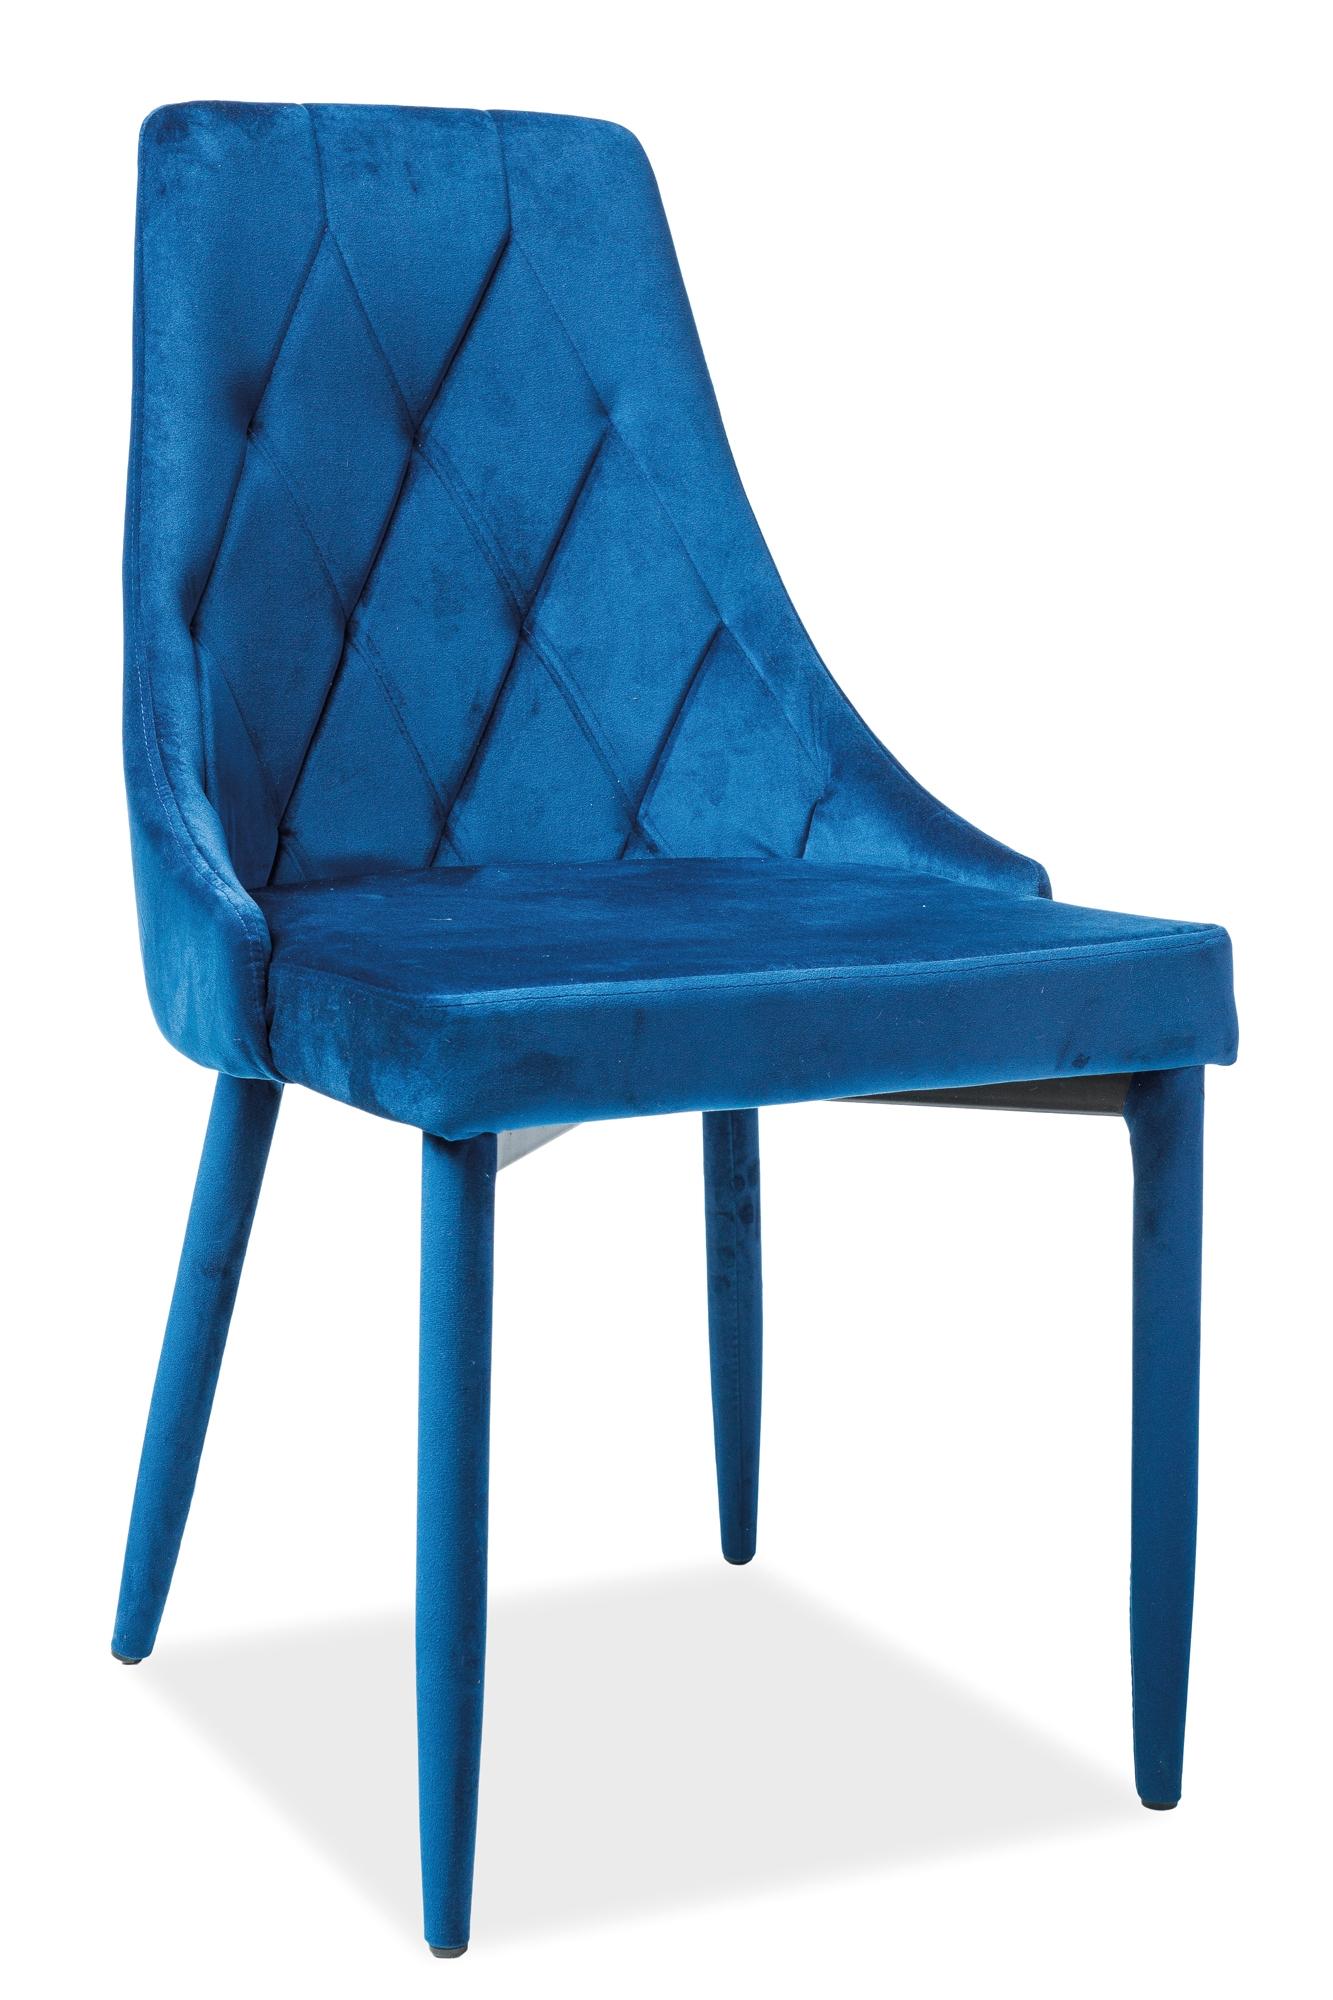 Scaun tapitat cu stofa si picioare metalice Trix Velvet Bleumarin, l46xA46xH88 cm